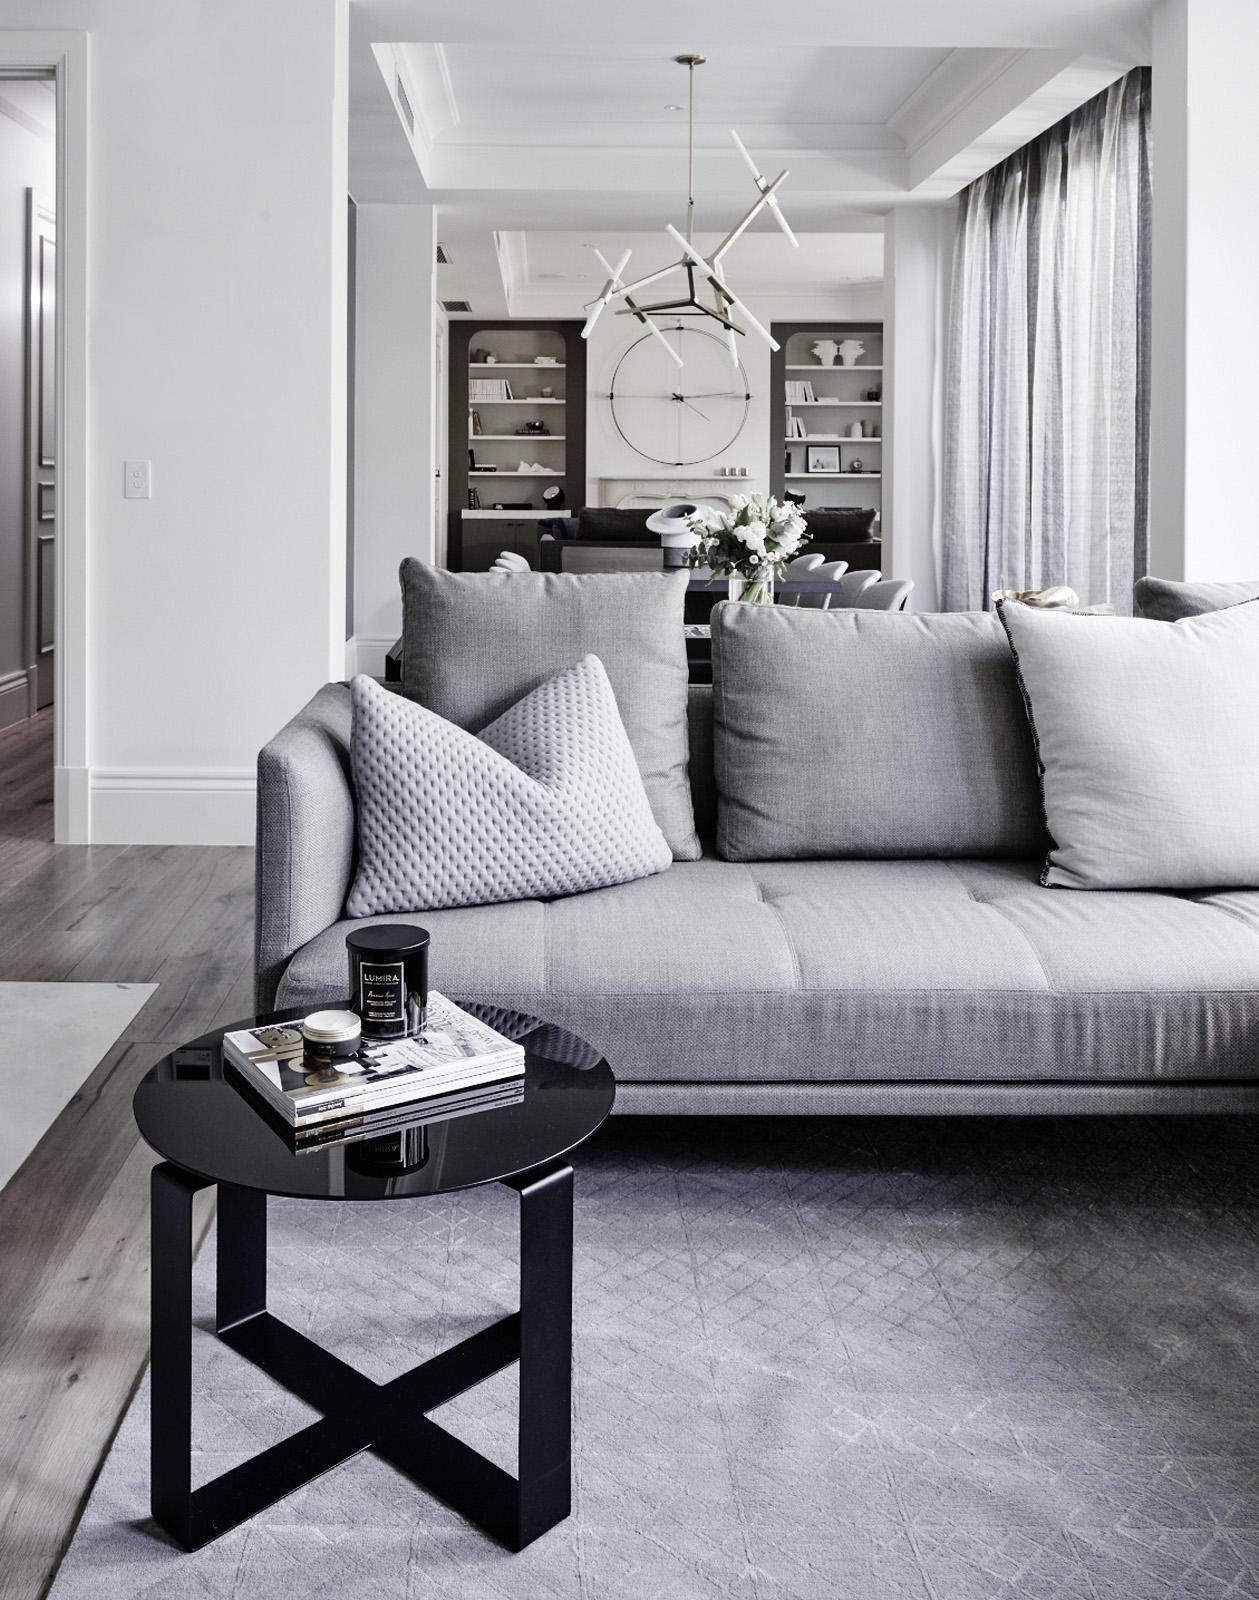 Toorak Apartment Image 13.jpg